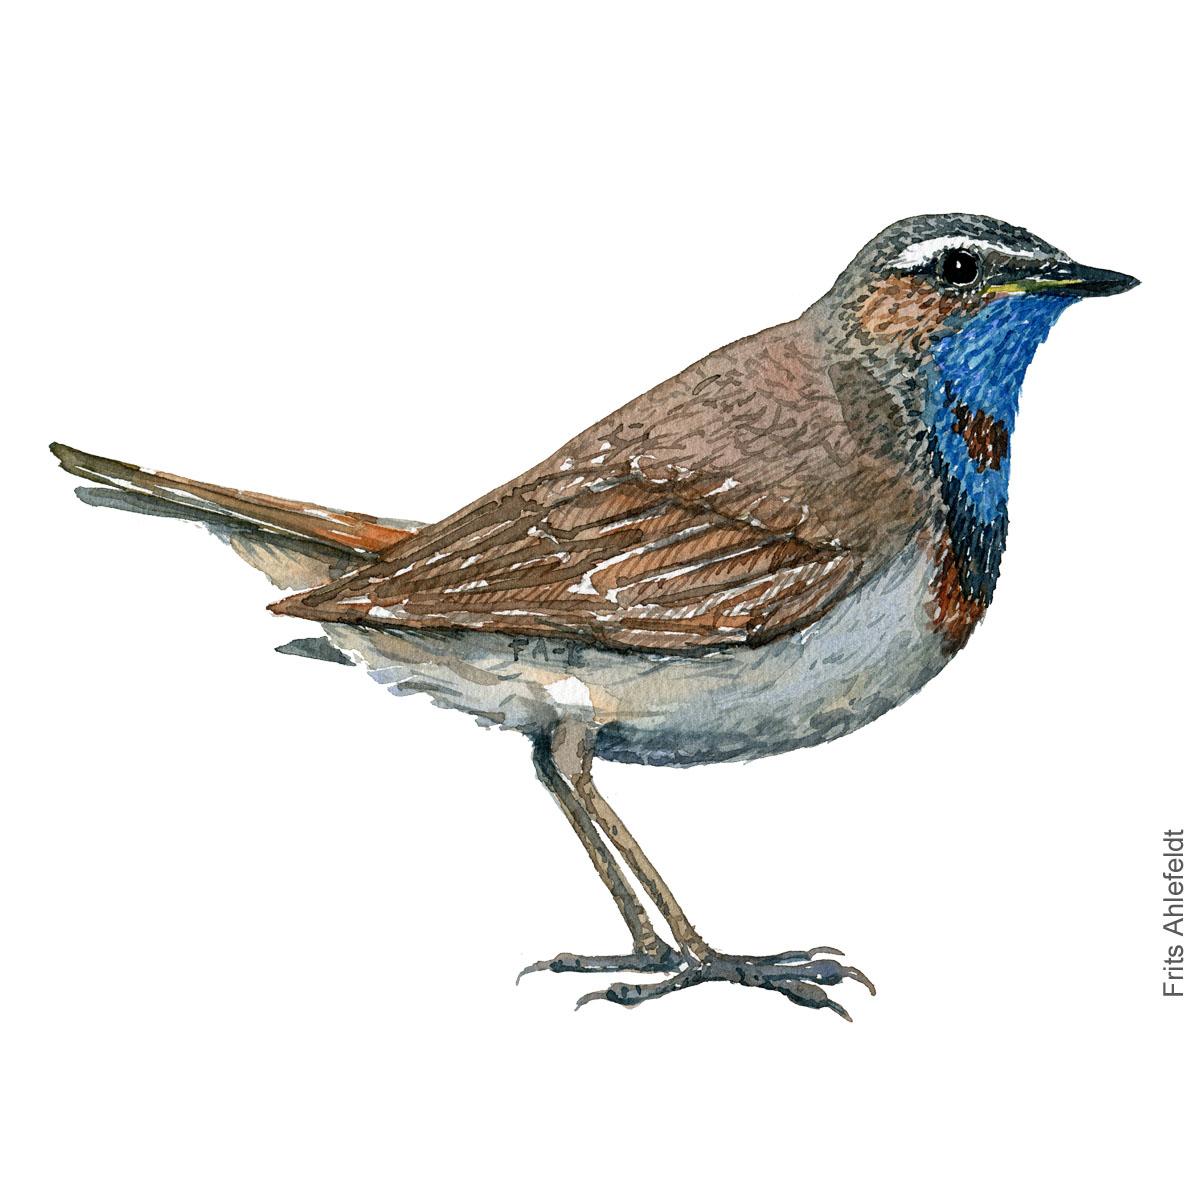 Blåhals - Bluethroat bird watercolor. Akvarel by Frits Ahlefeldt